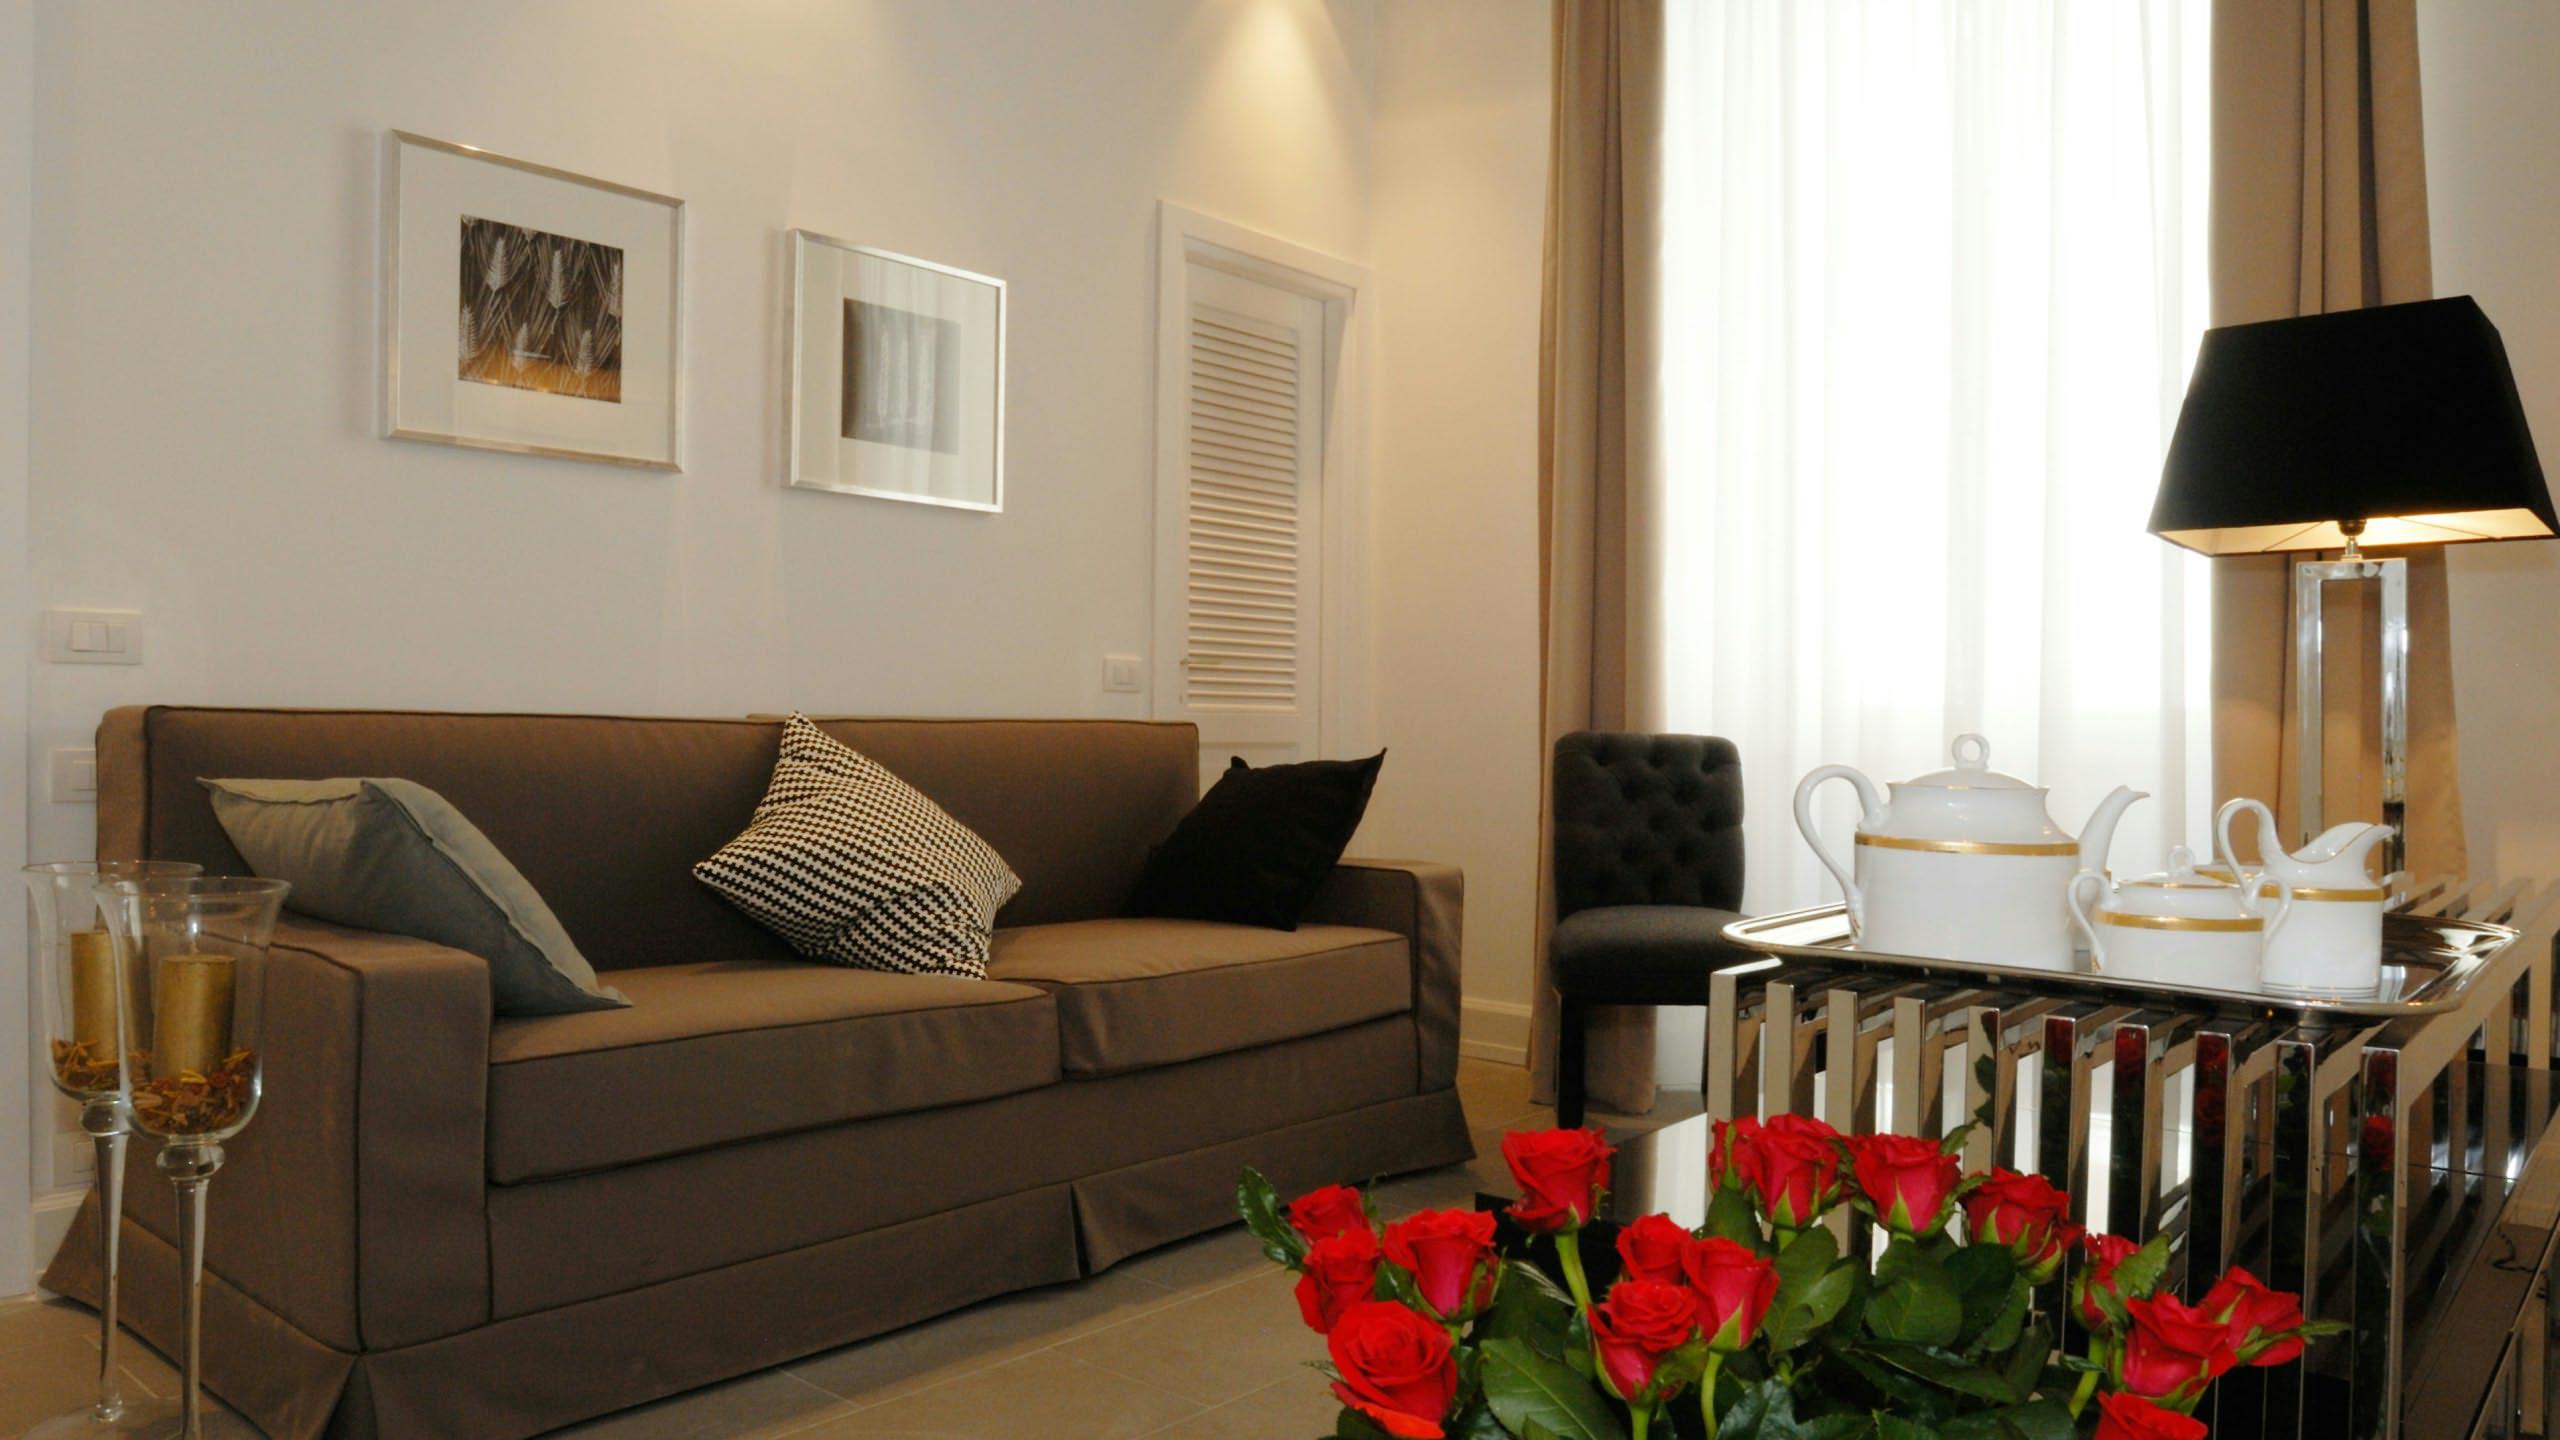 relais-vatican-view-rome-rooms-11